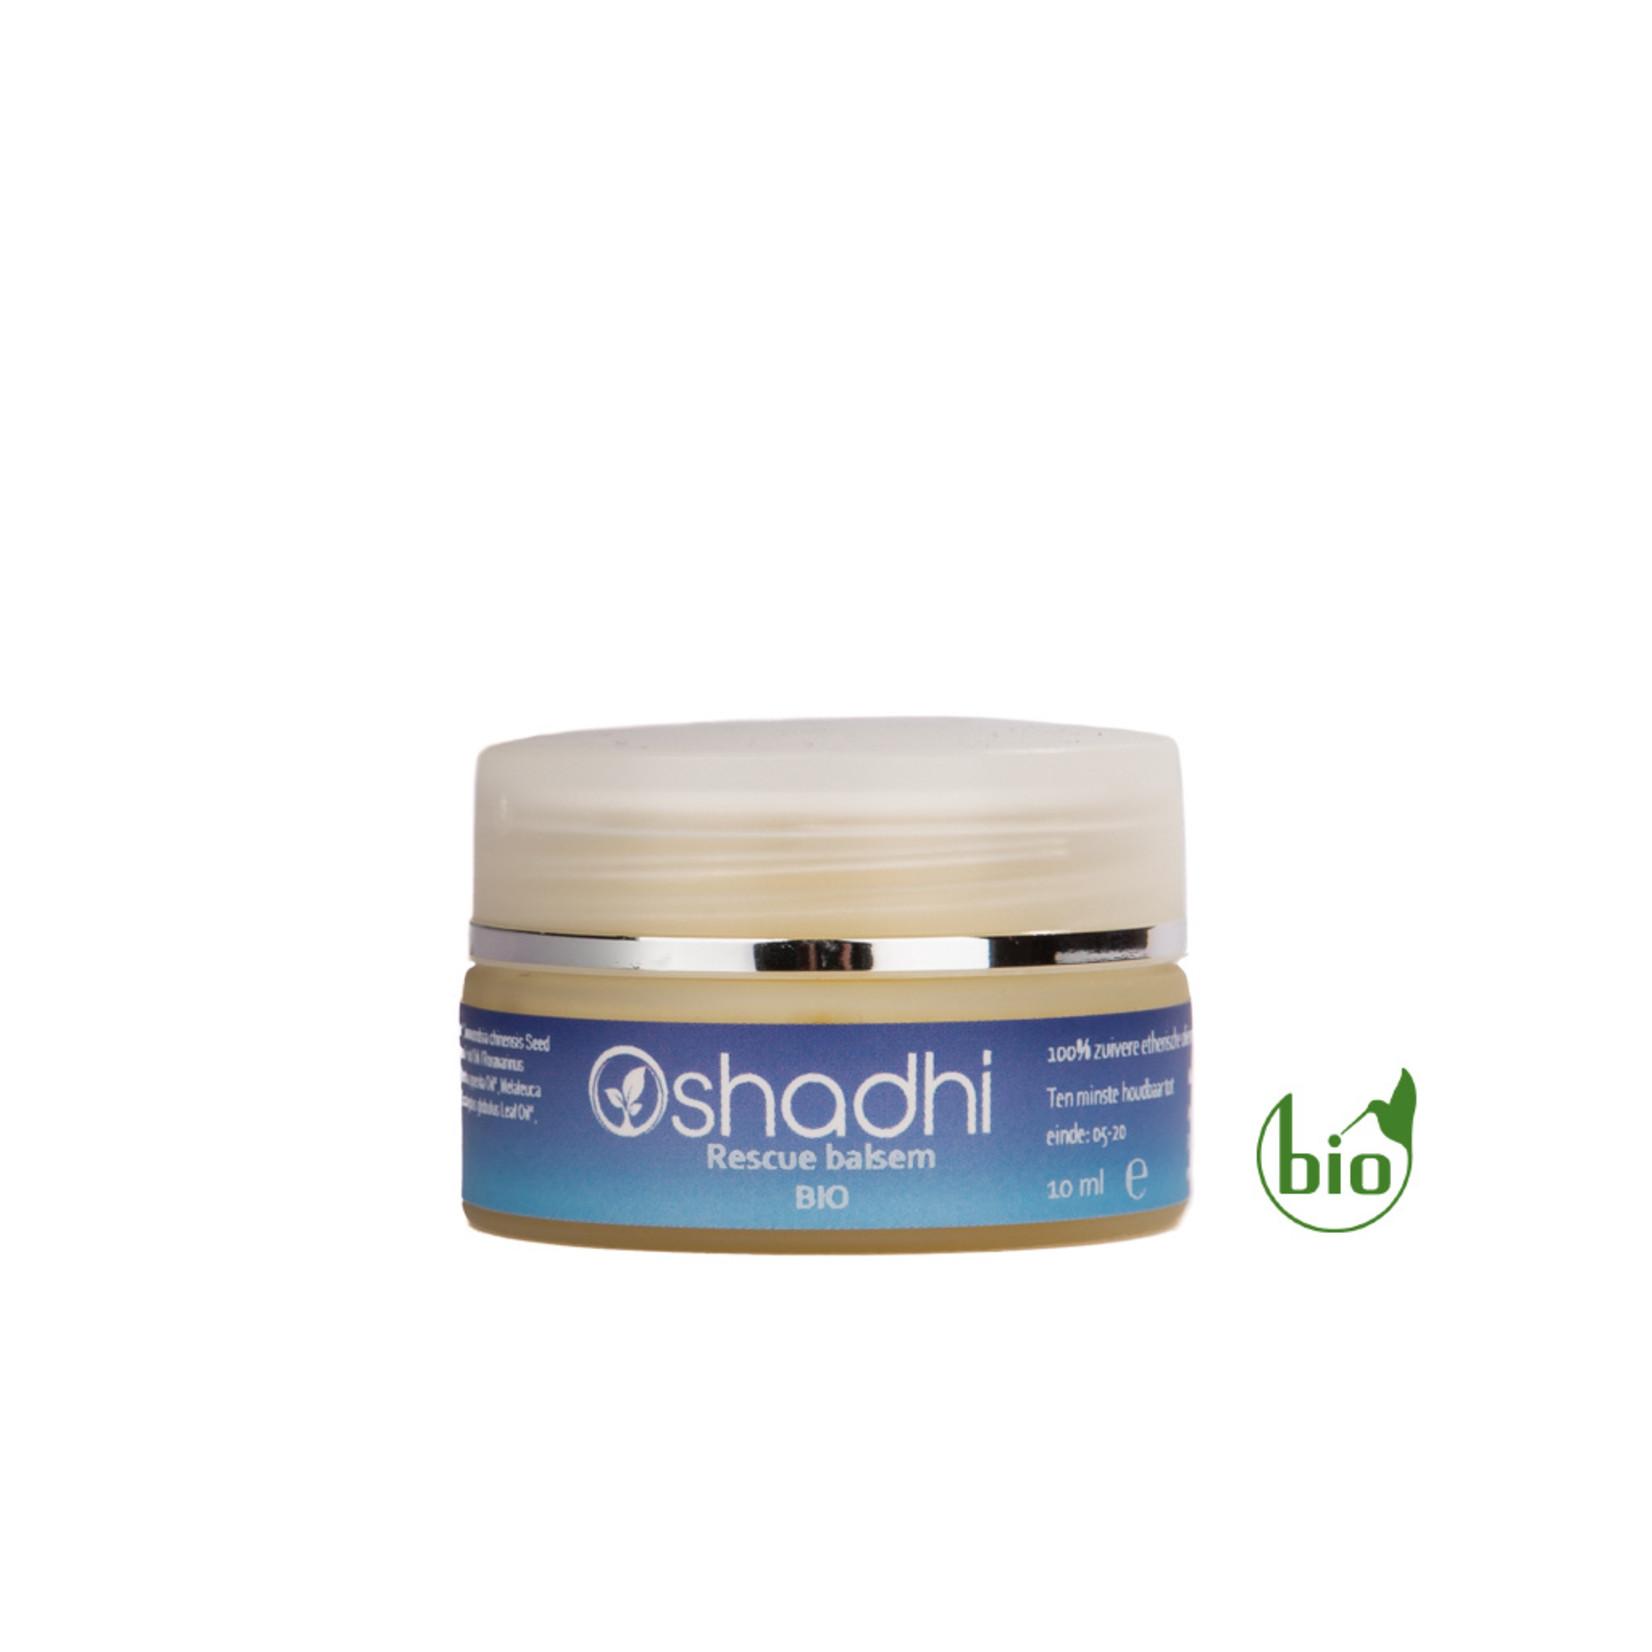 Oshadhi Rescue balsem Oshadhi - eerste hulp bij spanning & hevige pijn - 10ml